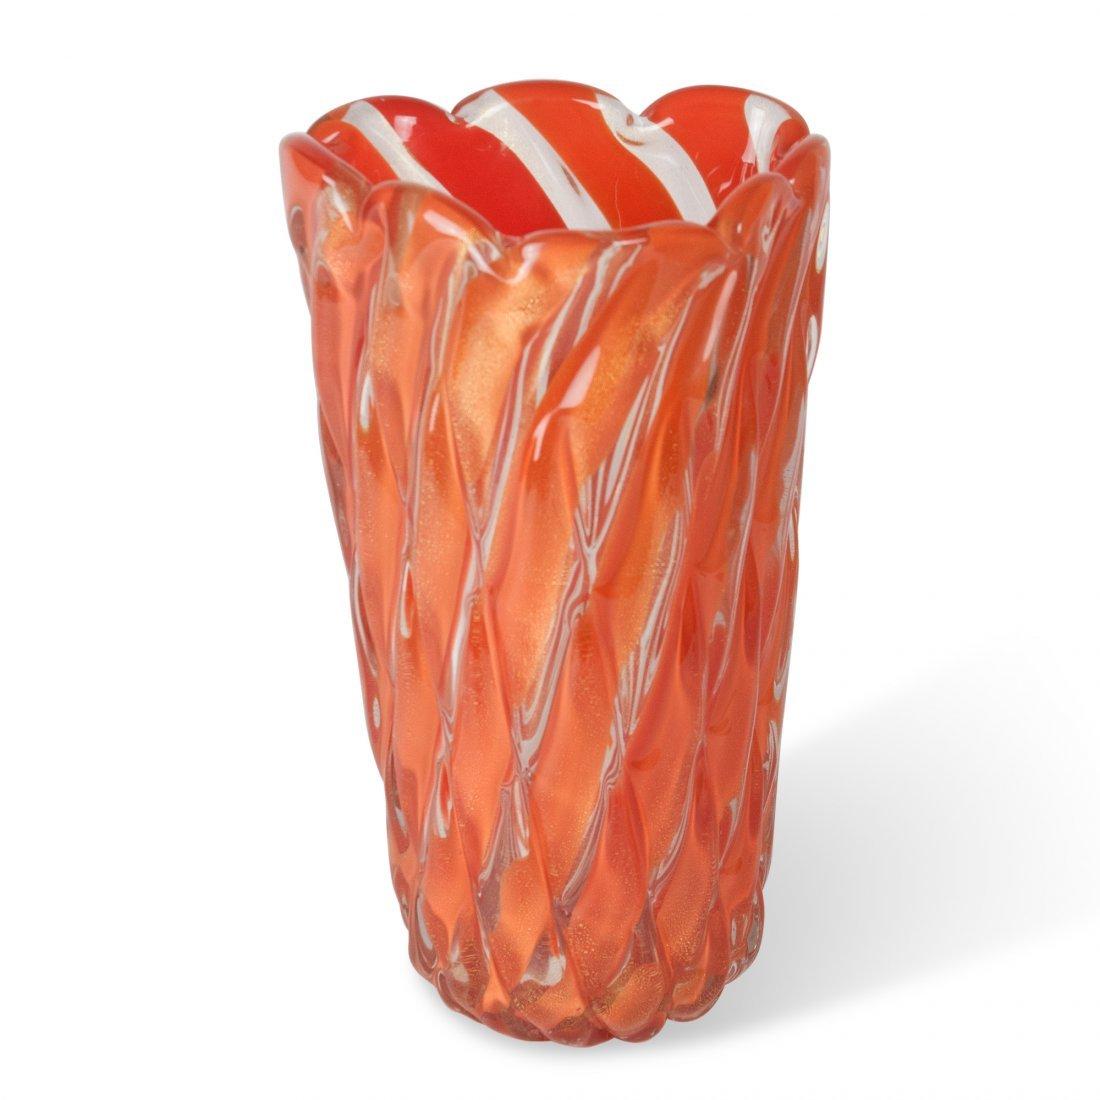 Orange Cased Glass Vase by Barovier